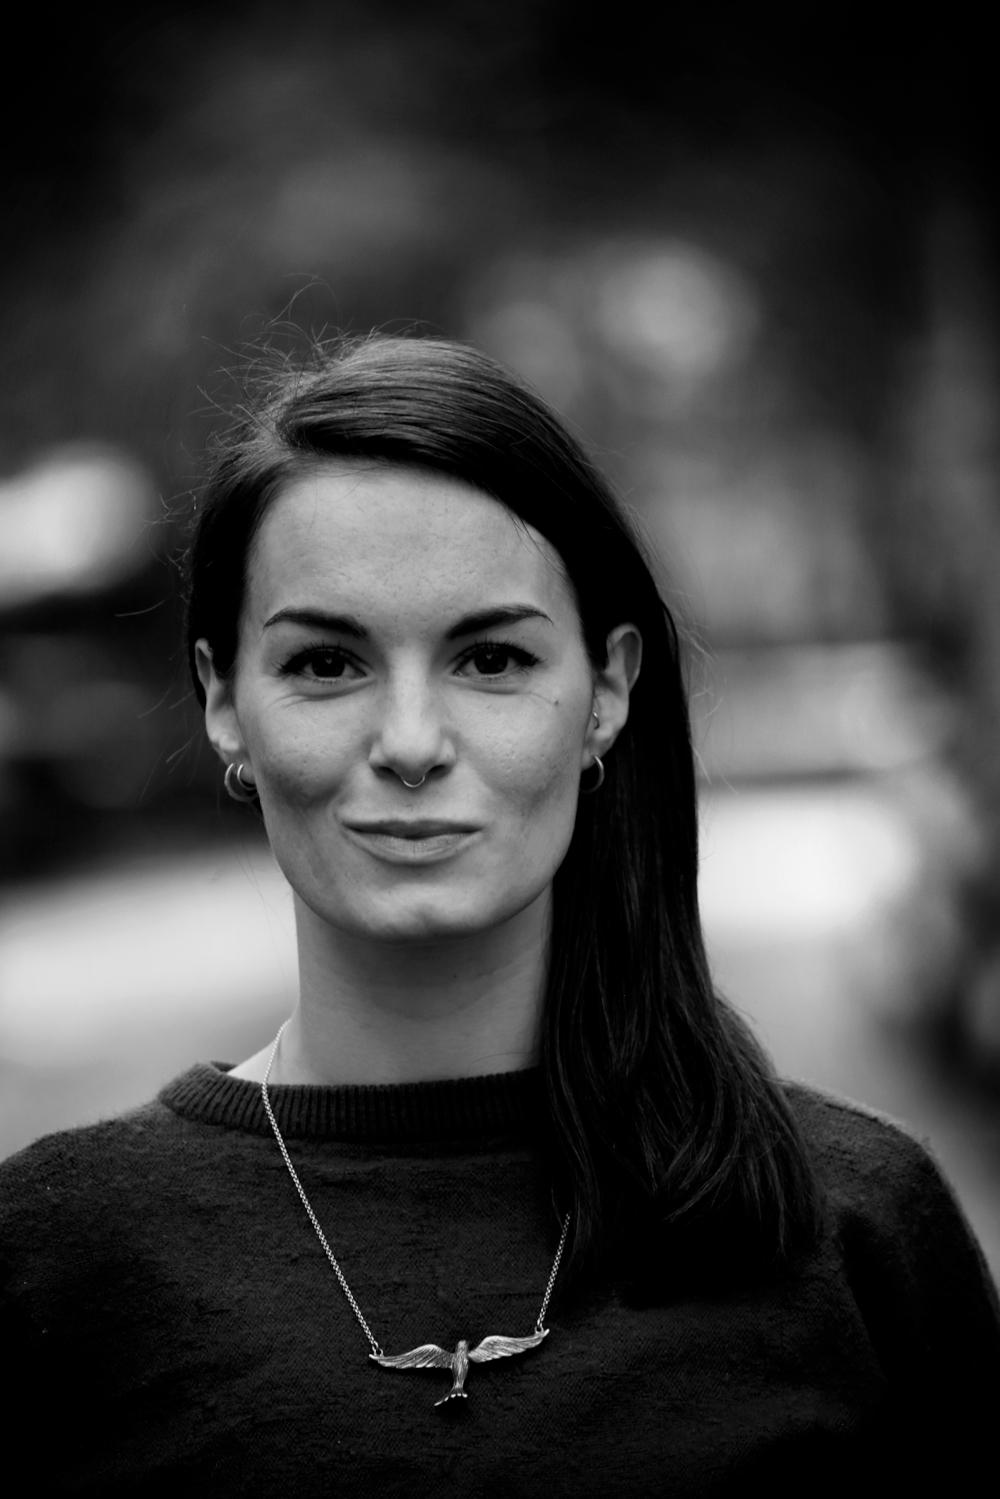 En seig undergangshistorie - Ida Frisch er aktuell med Klør, en roman som ifølge Bernhard Ellefsen gir